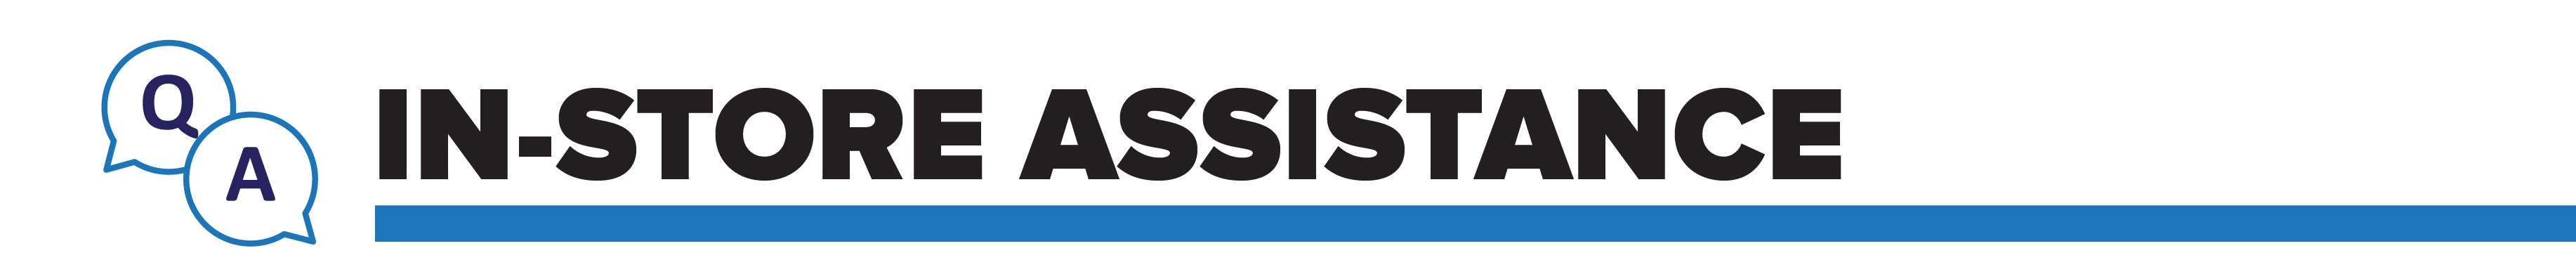 InStore_Assistance_Google_Artboard 5